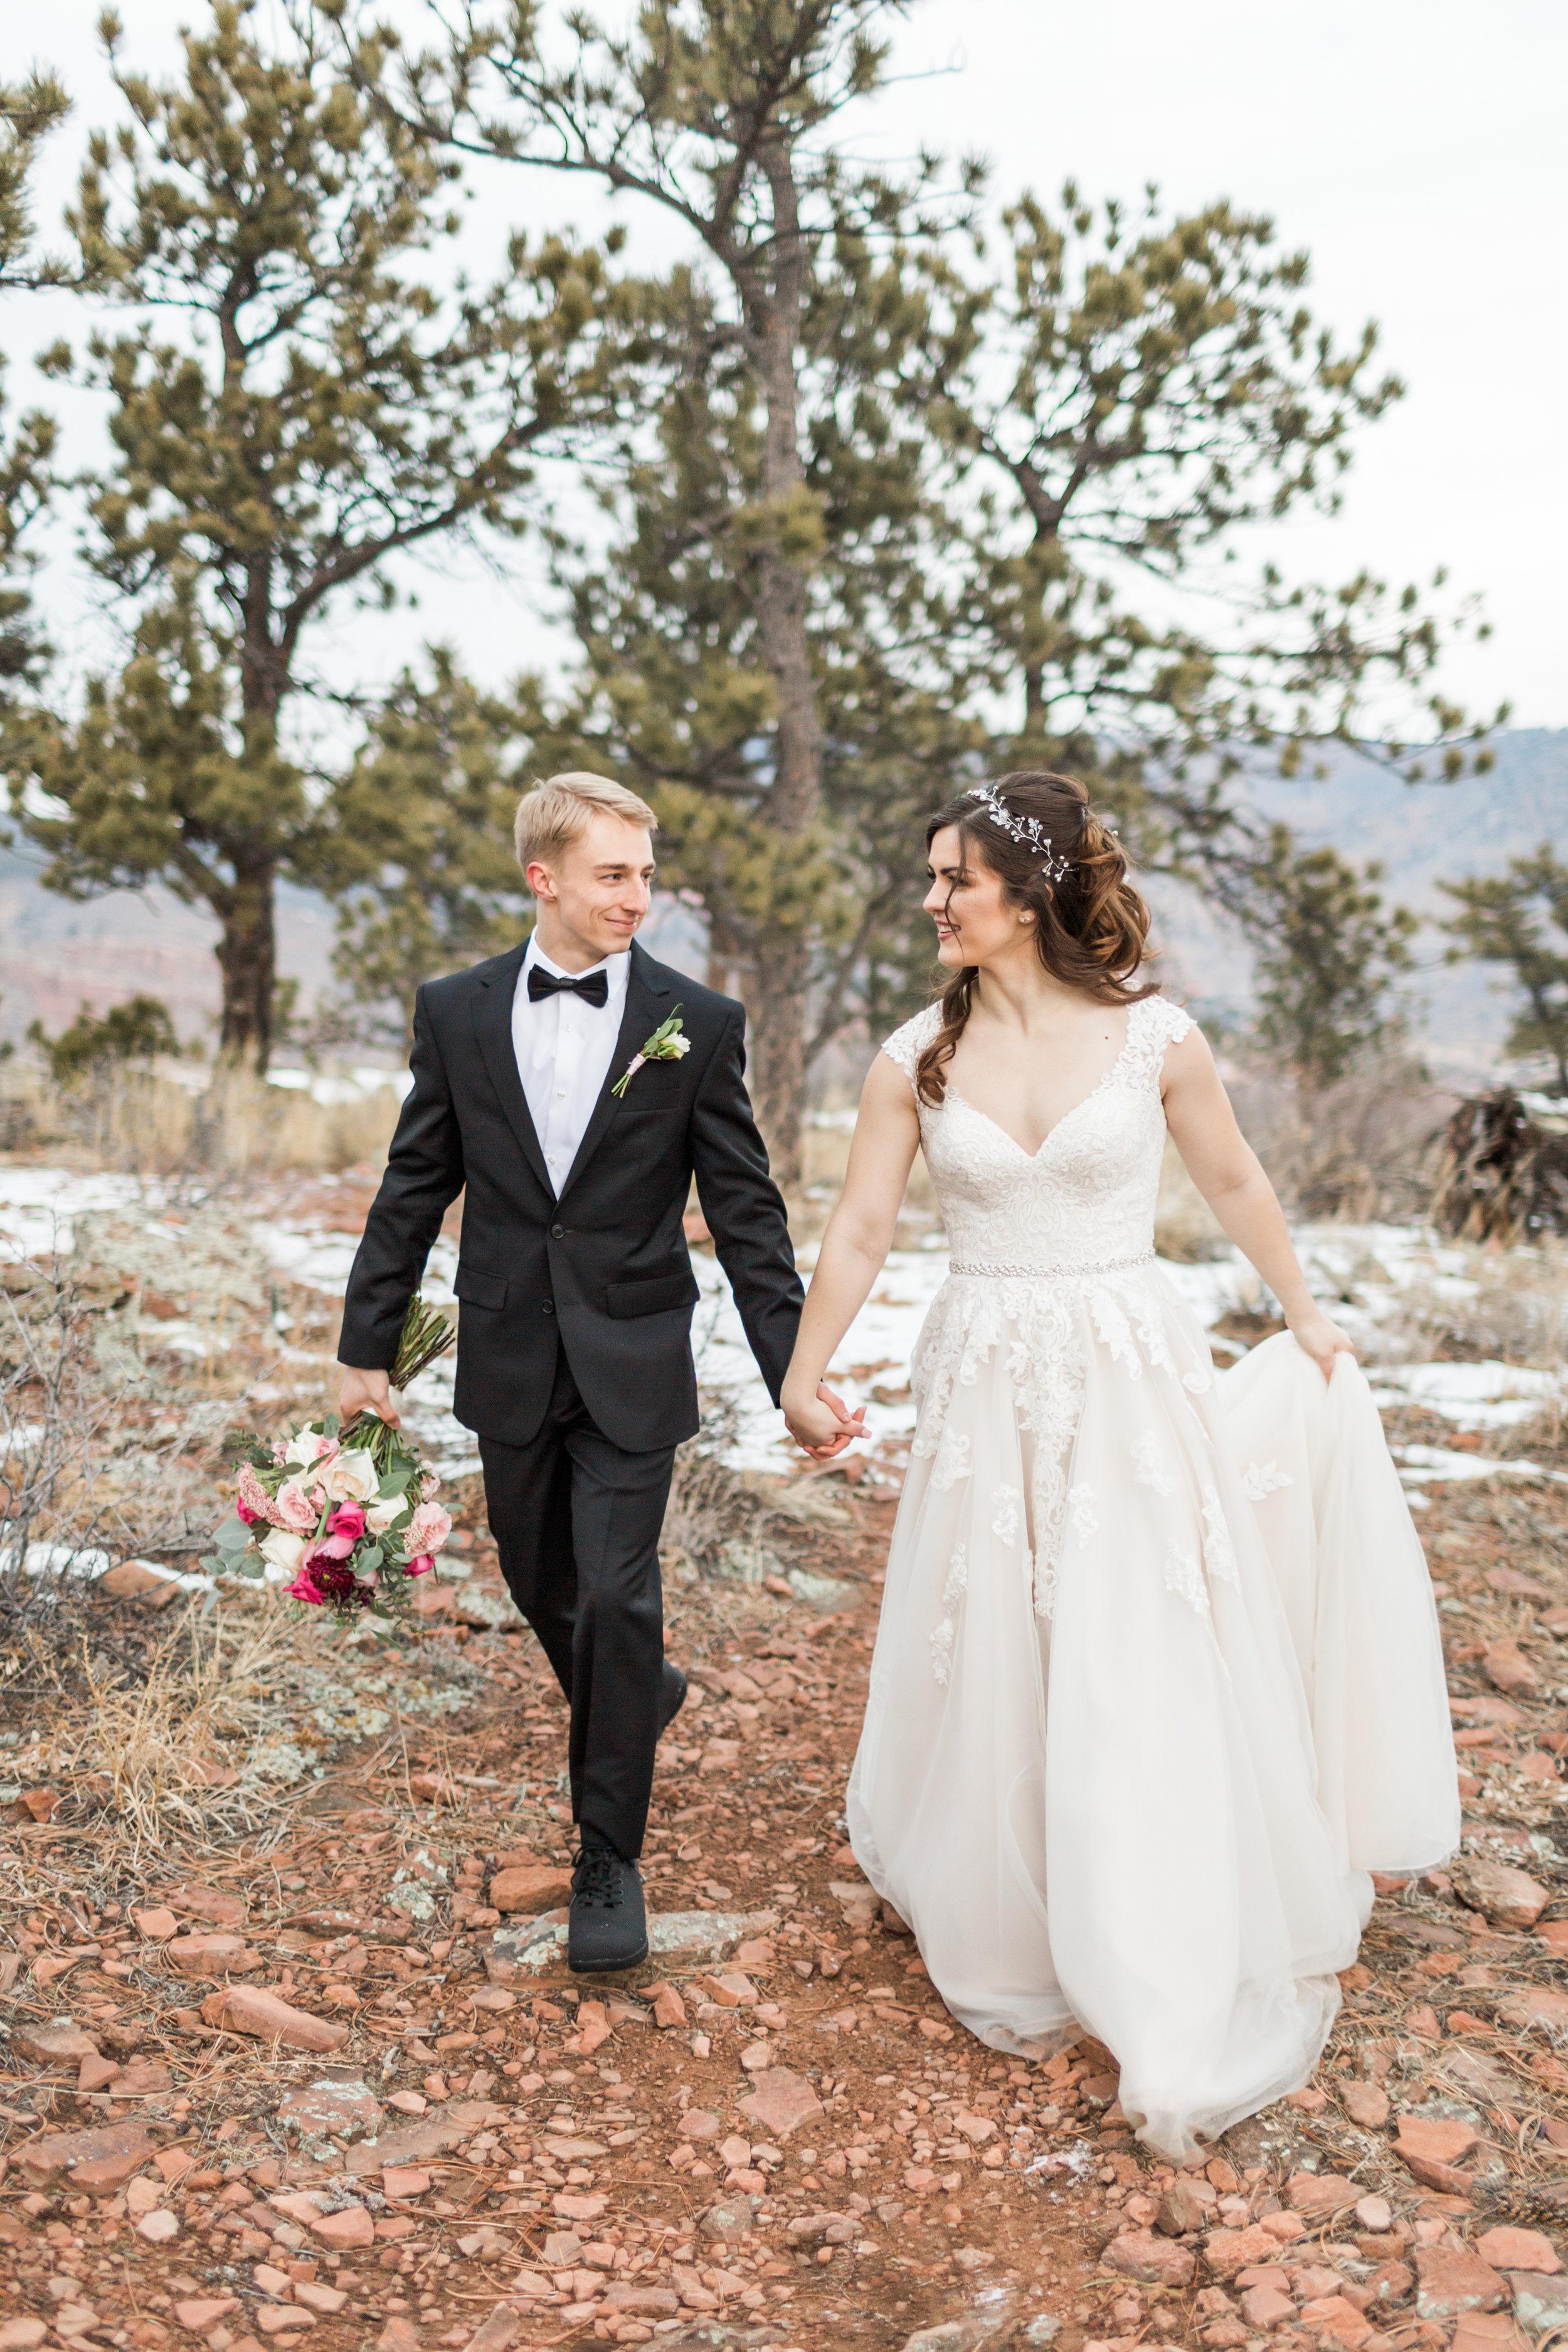 romanticcoloradodestinationwedding-46.jpg